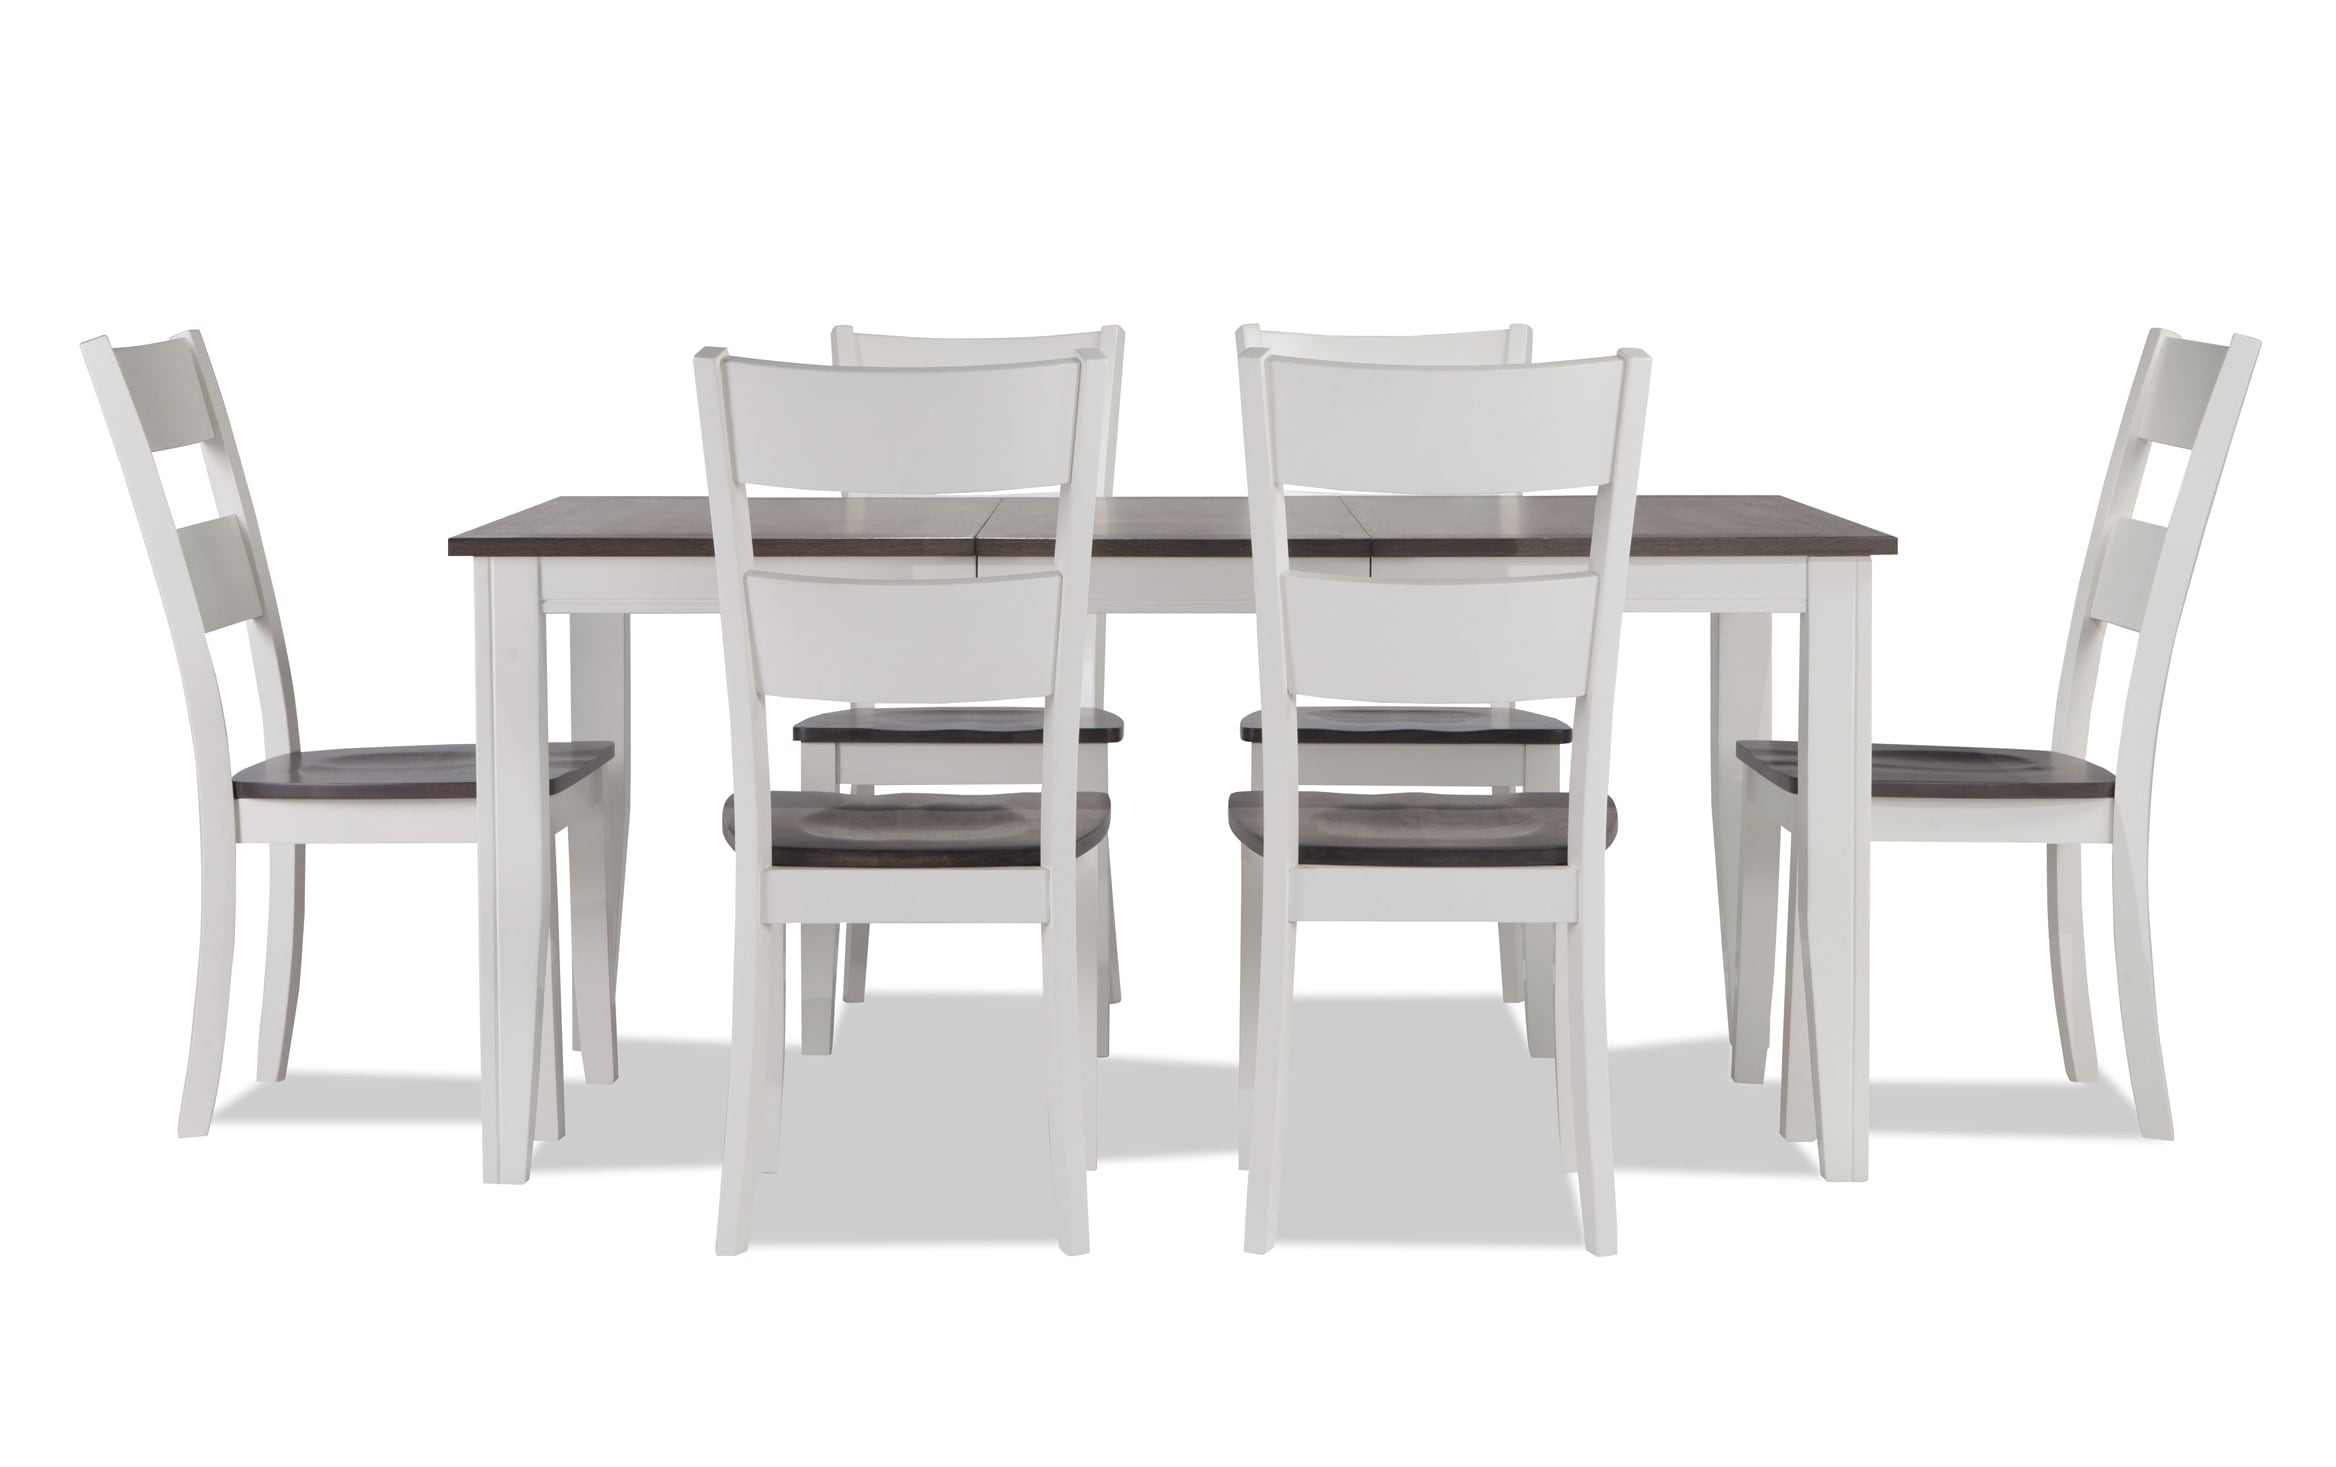 Blake Gray White 7 Piece Dining Set, Black And White Dining Room Set